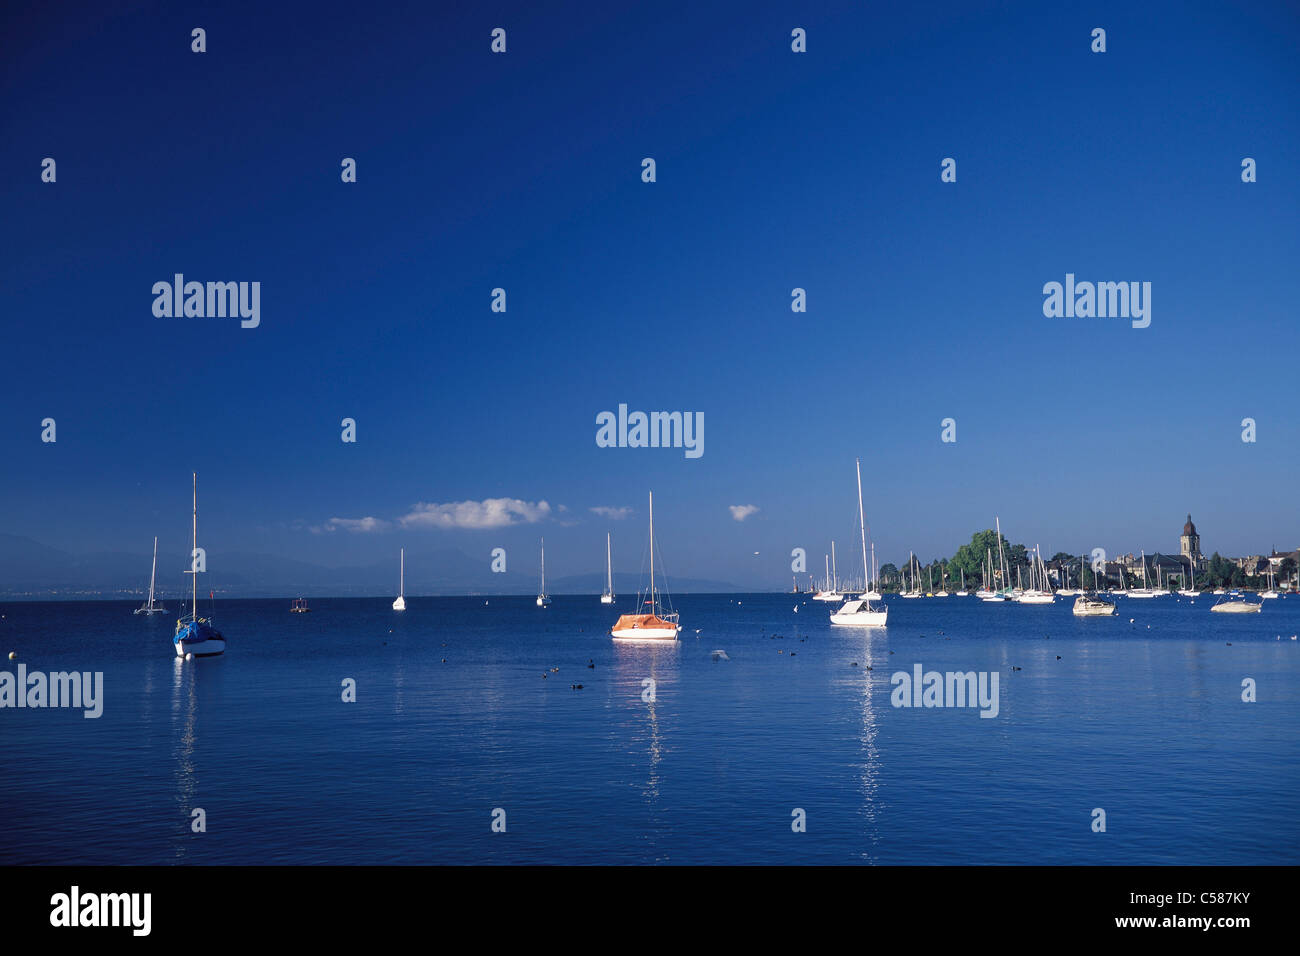 Vaud, harbour, port, scenery, ship, ships, ship, Morges, Switzerland, Europe, lake, Lac Léman, lake Geneva, - Stock Image